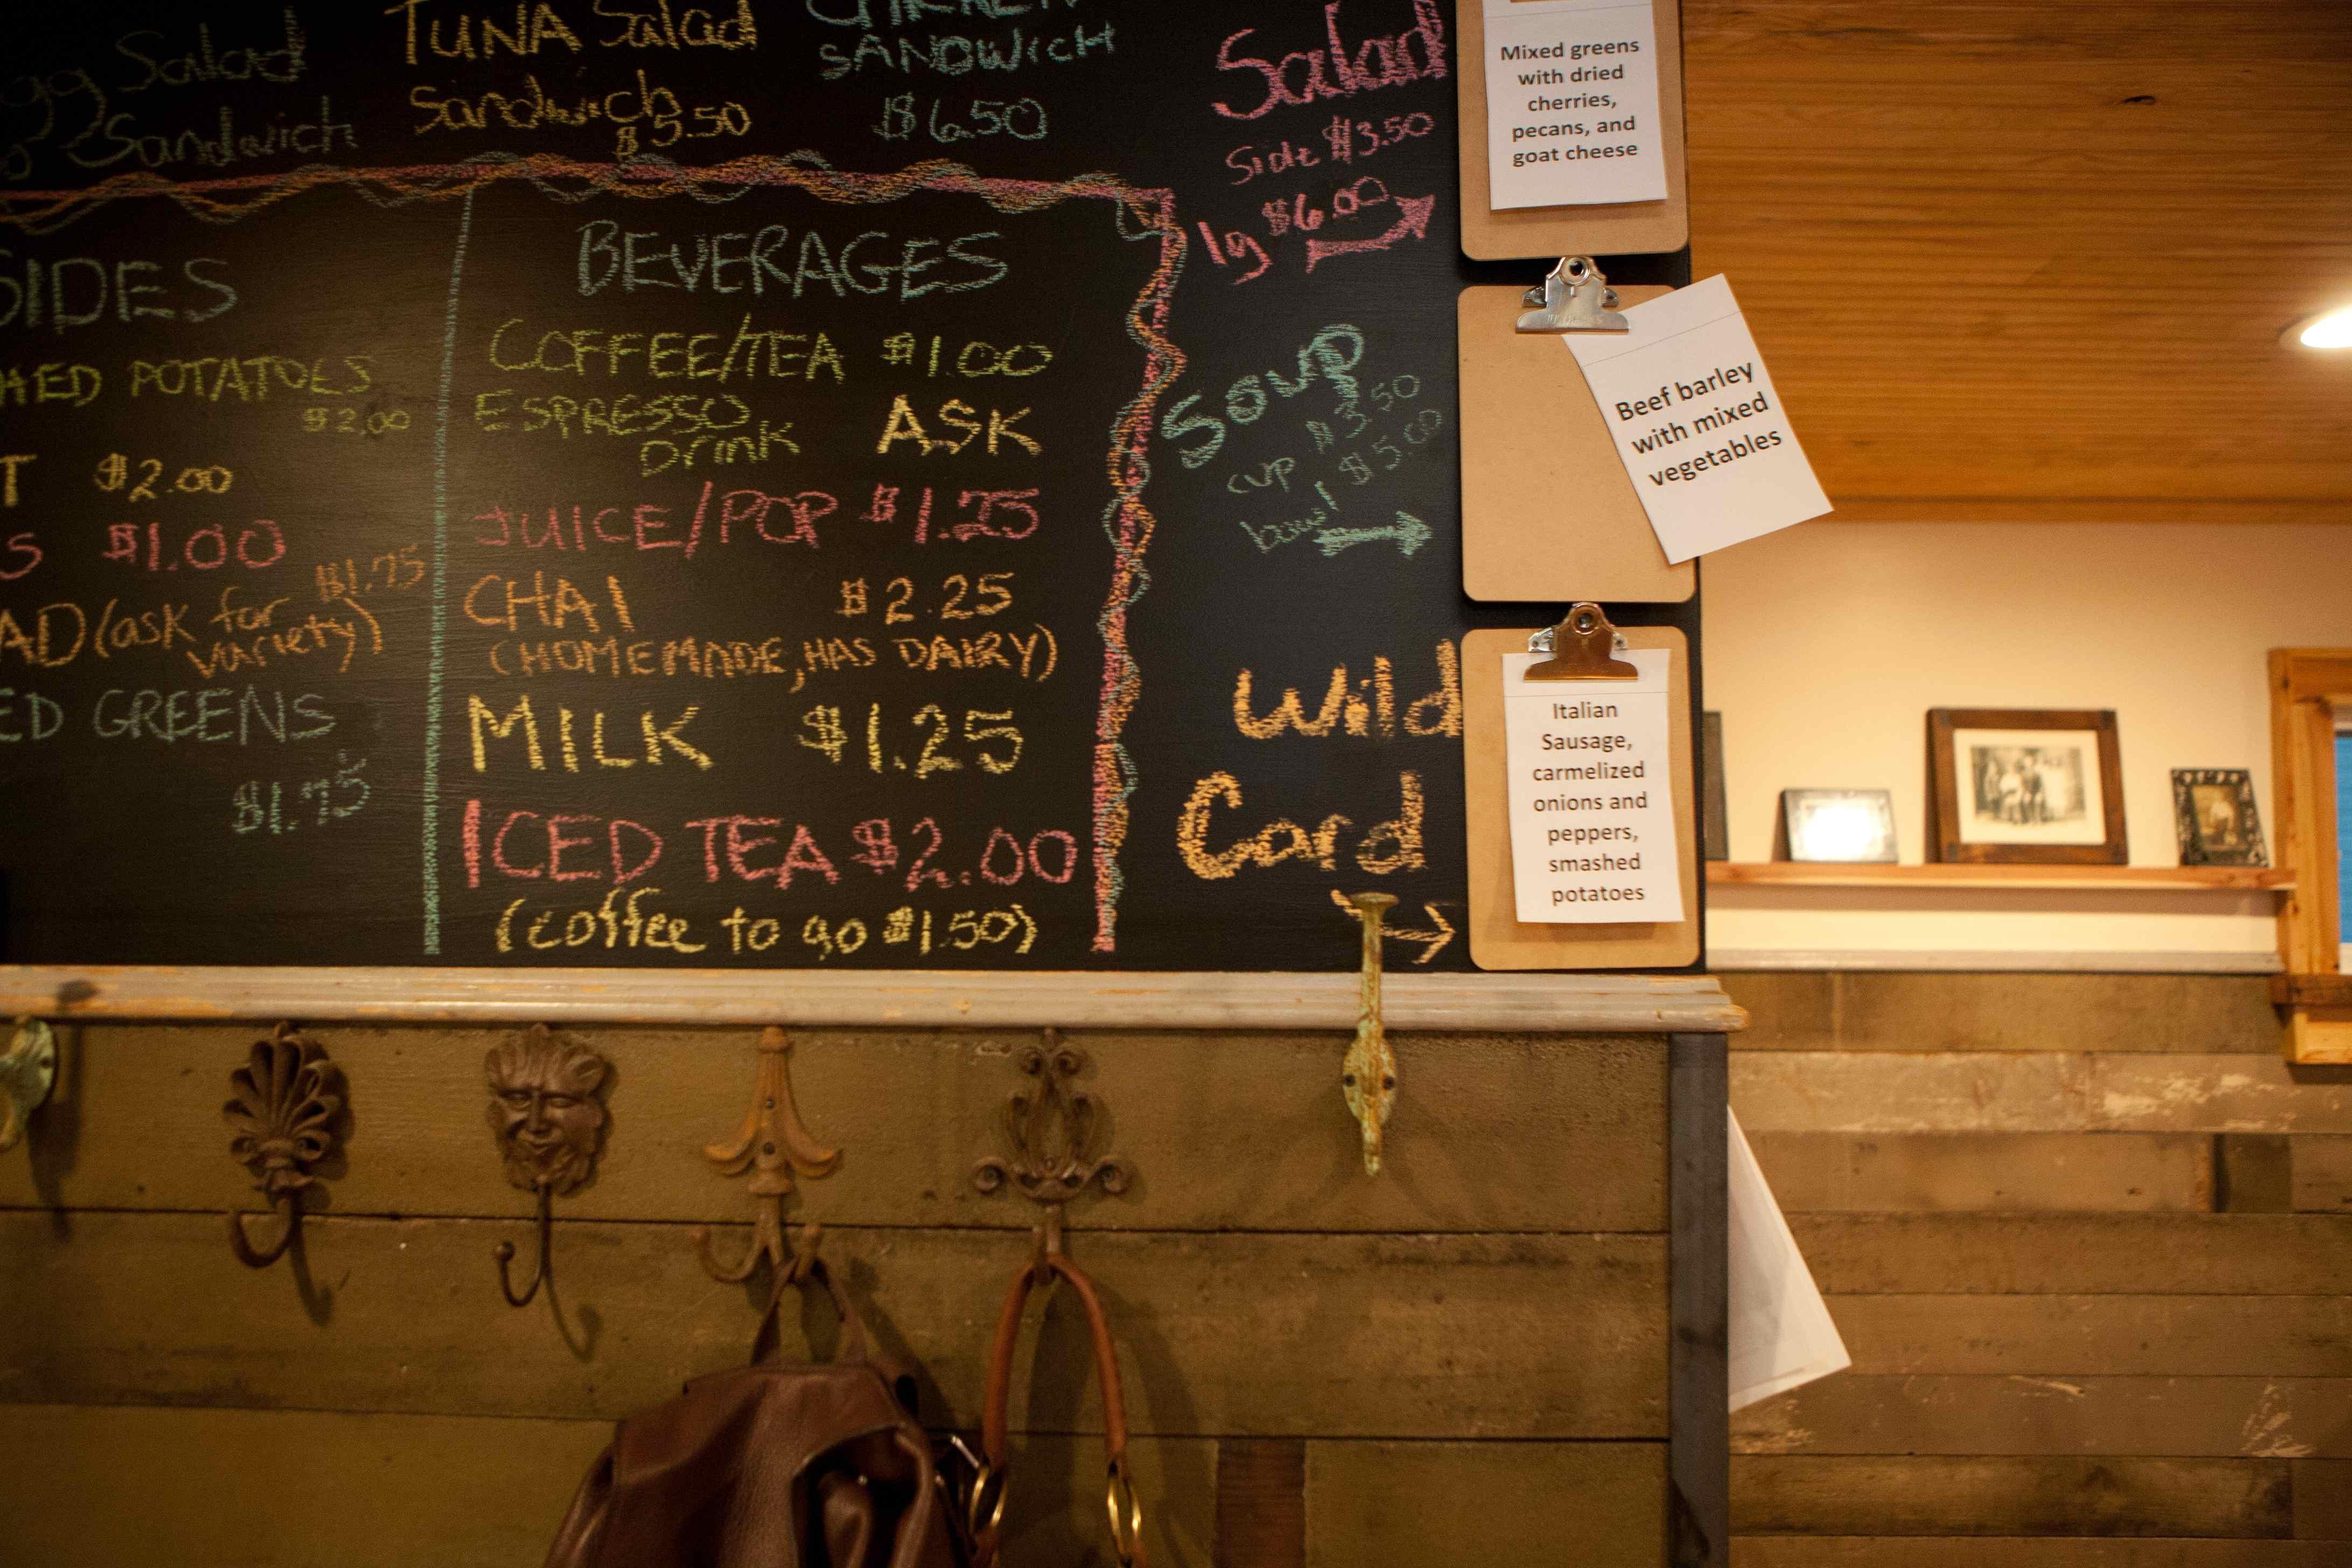 small cafe pittsboro nc